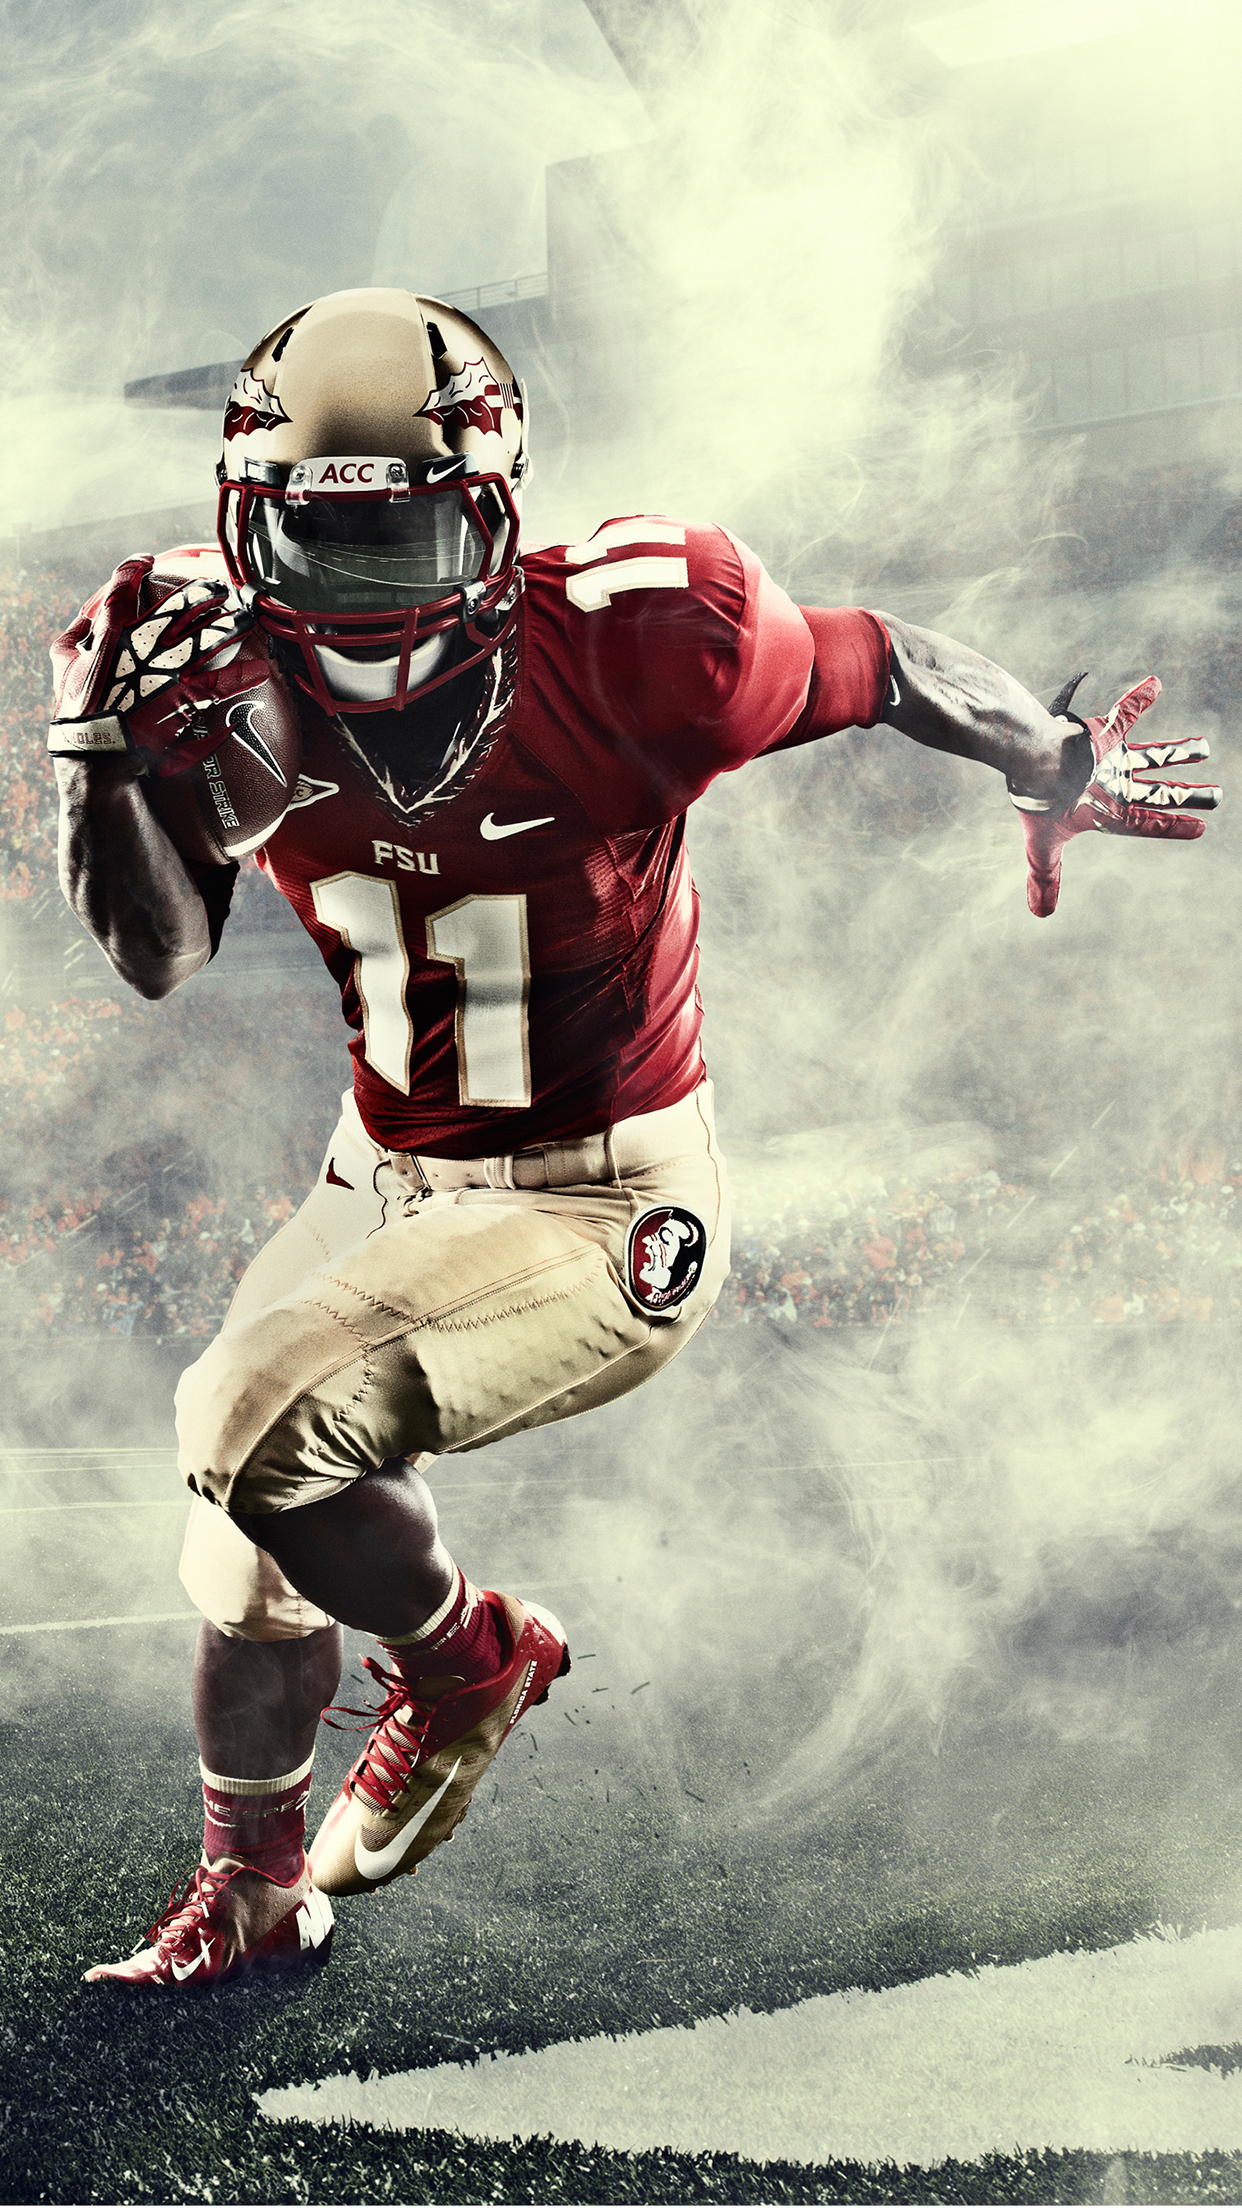 Hd wallpaper whatsapp download - Wallpaper Hd Iphone American Football Nike Free Download